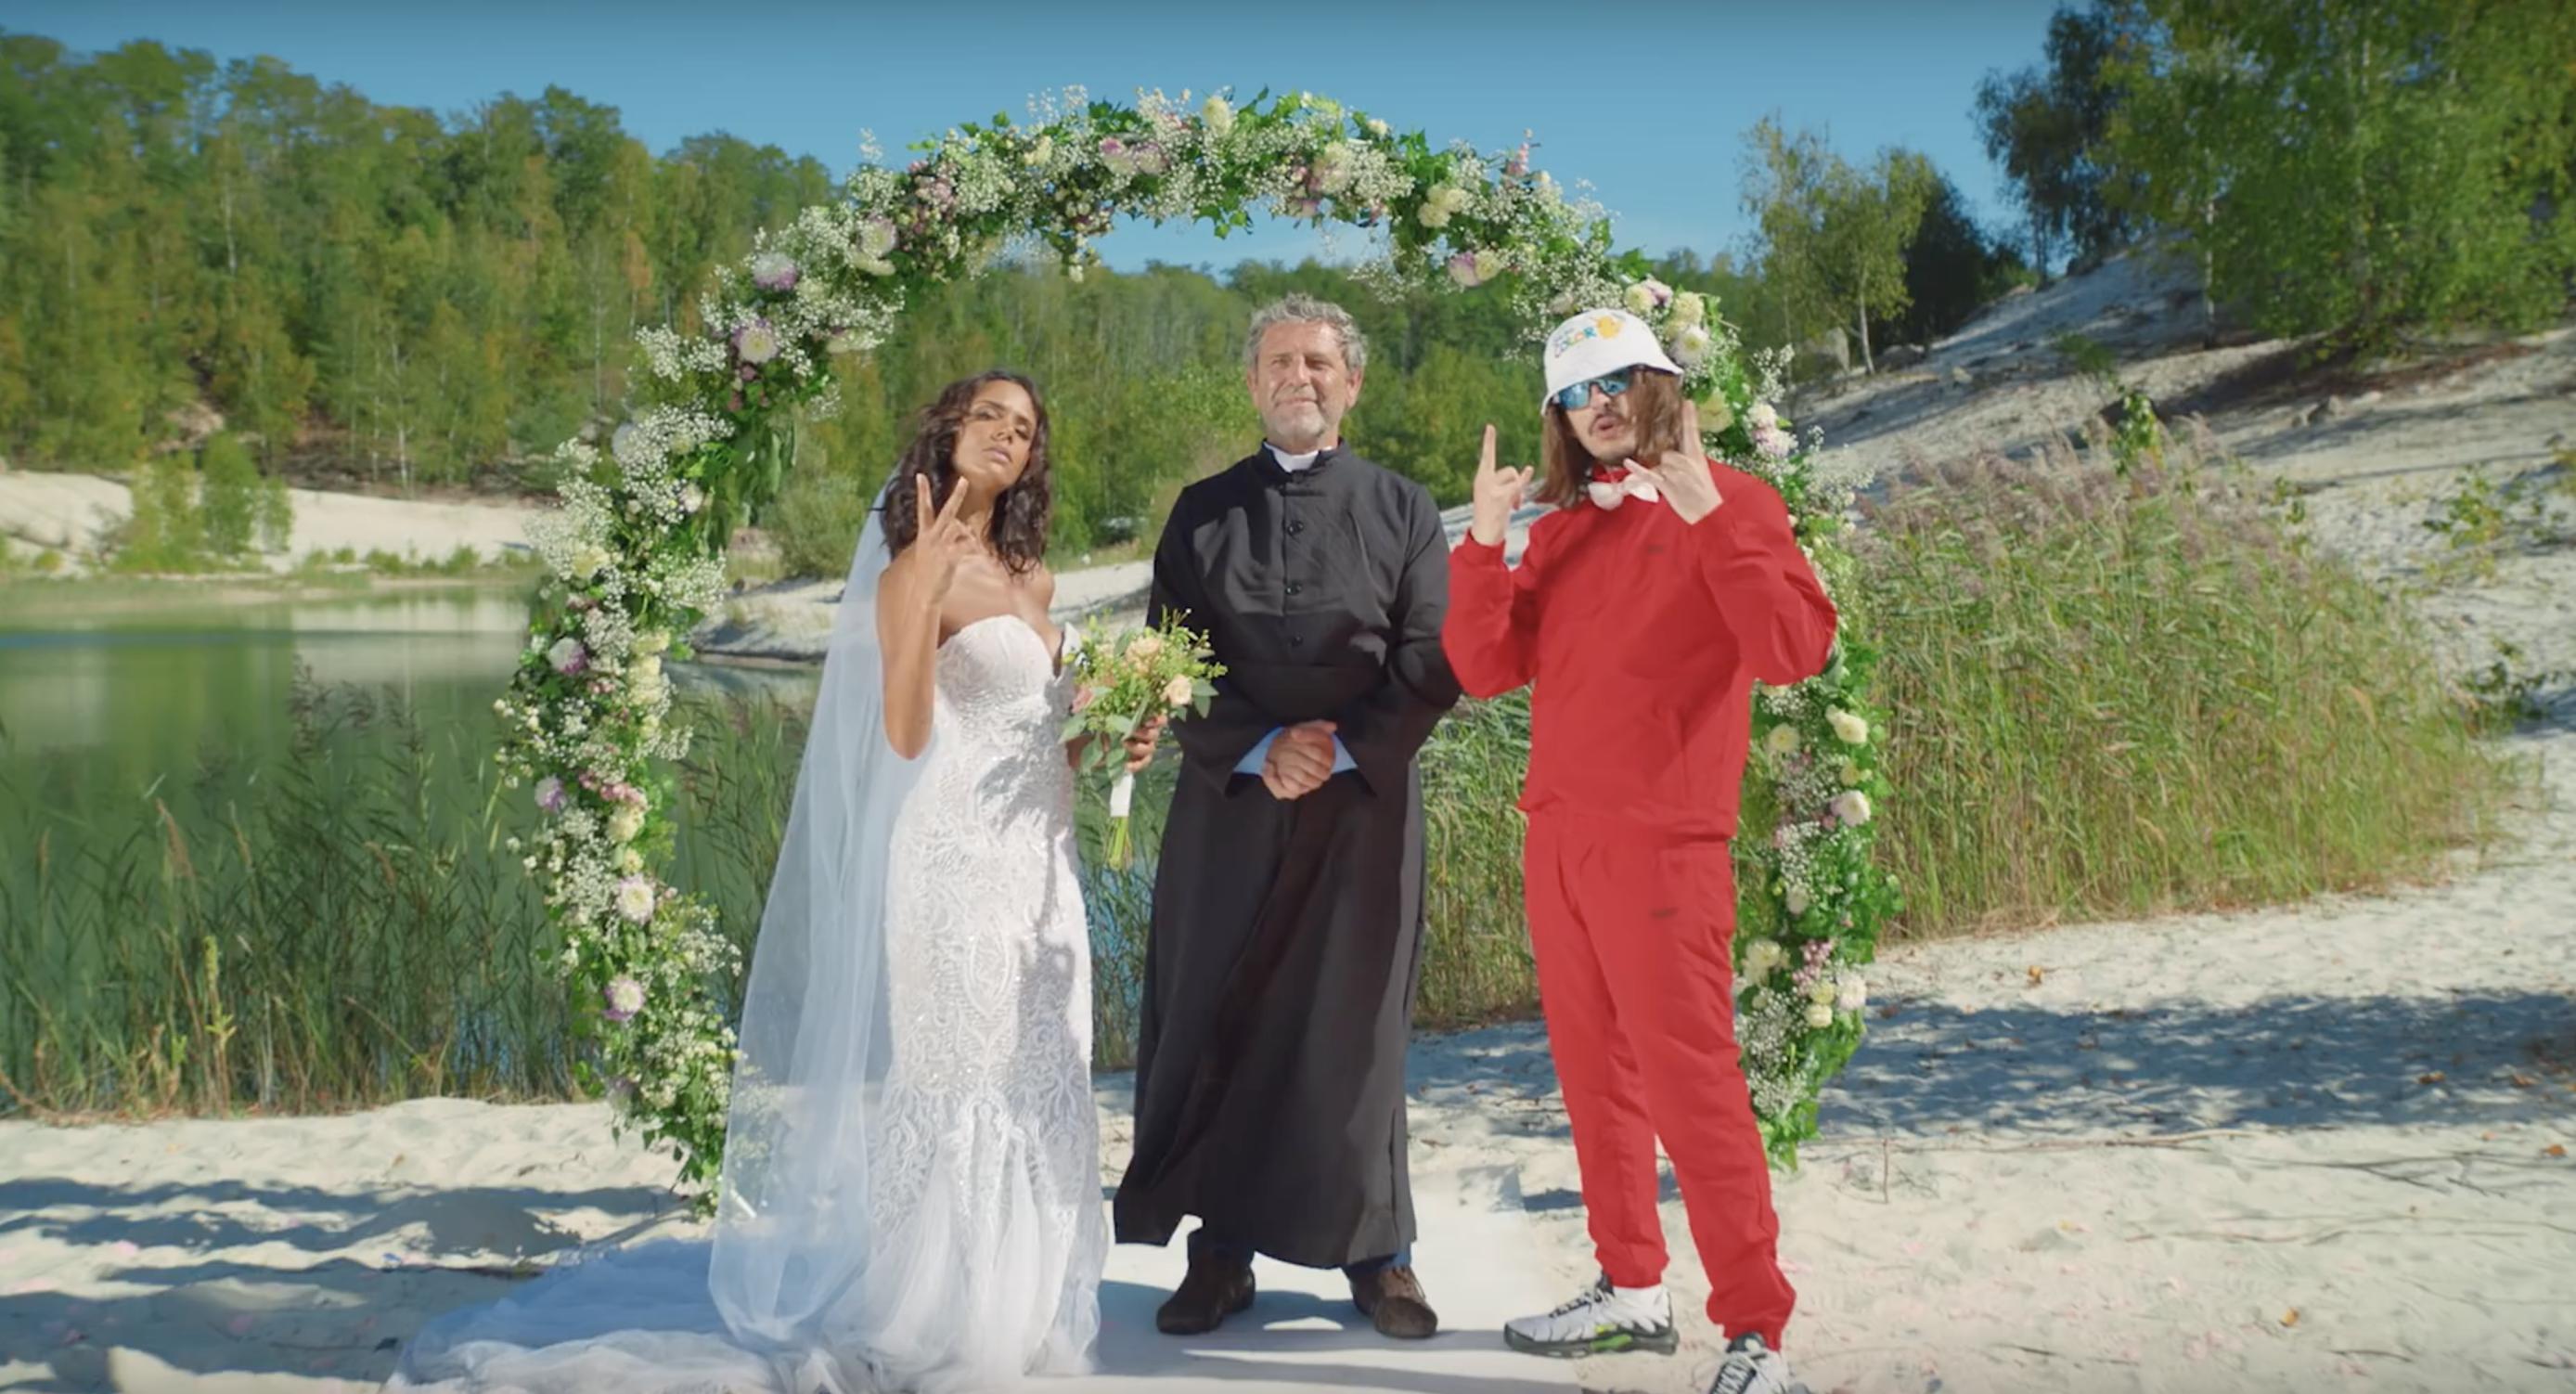 Lorenzo - Shy'm - Nous deux - clip - mariage